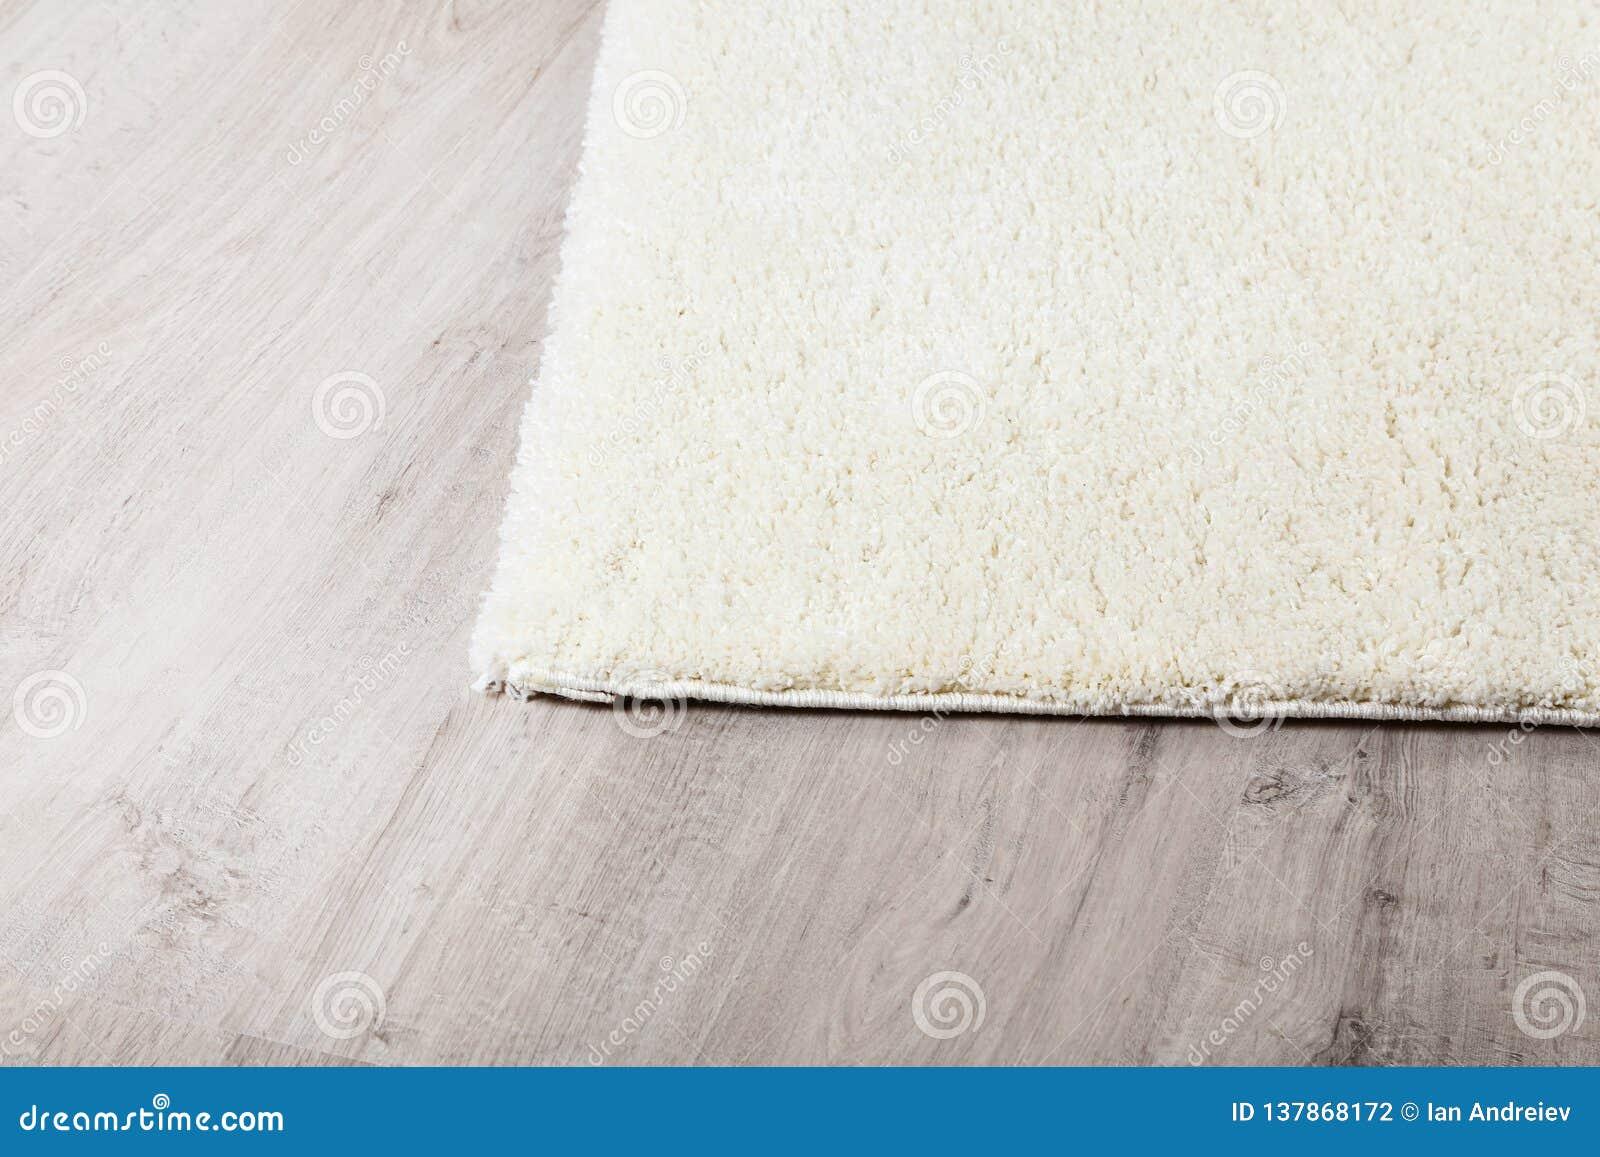 Carpet on laminate flooring